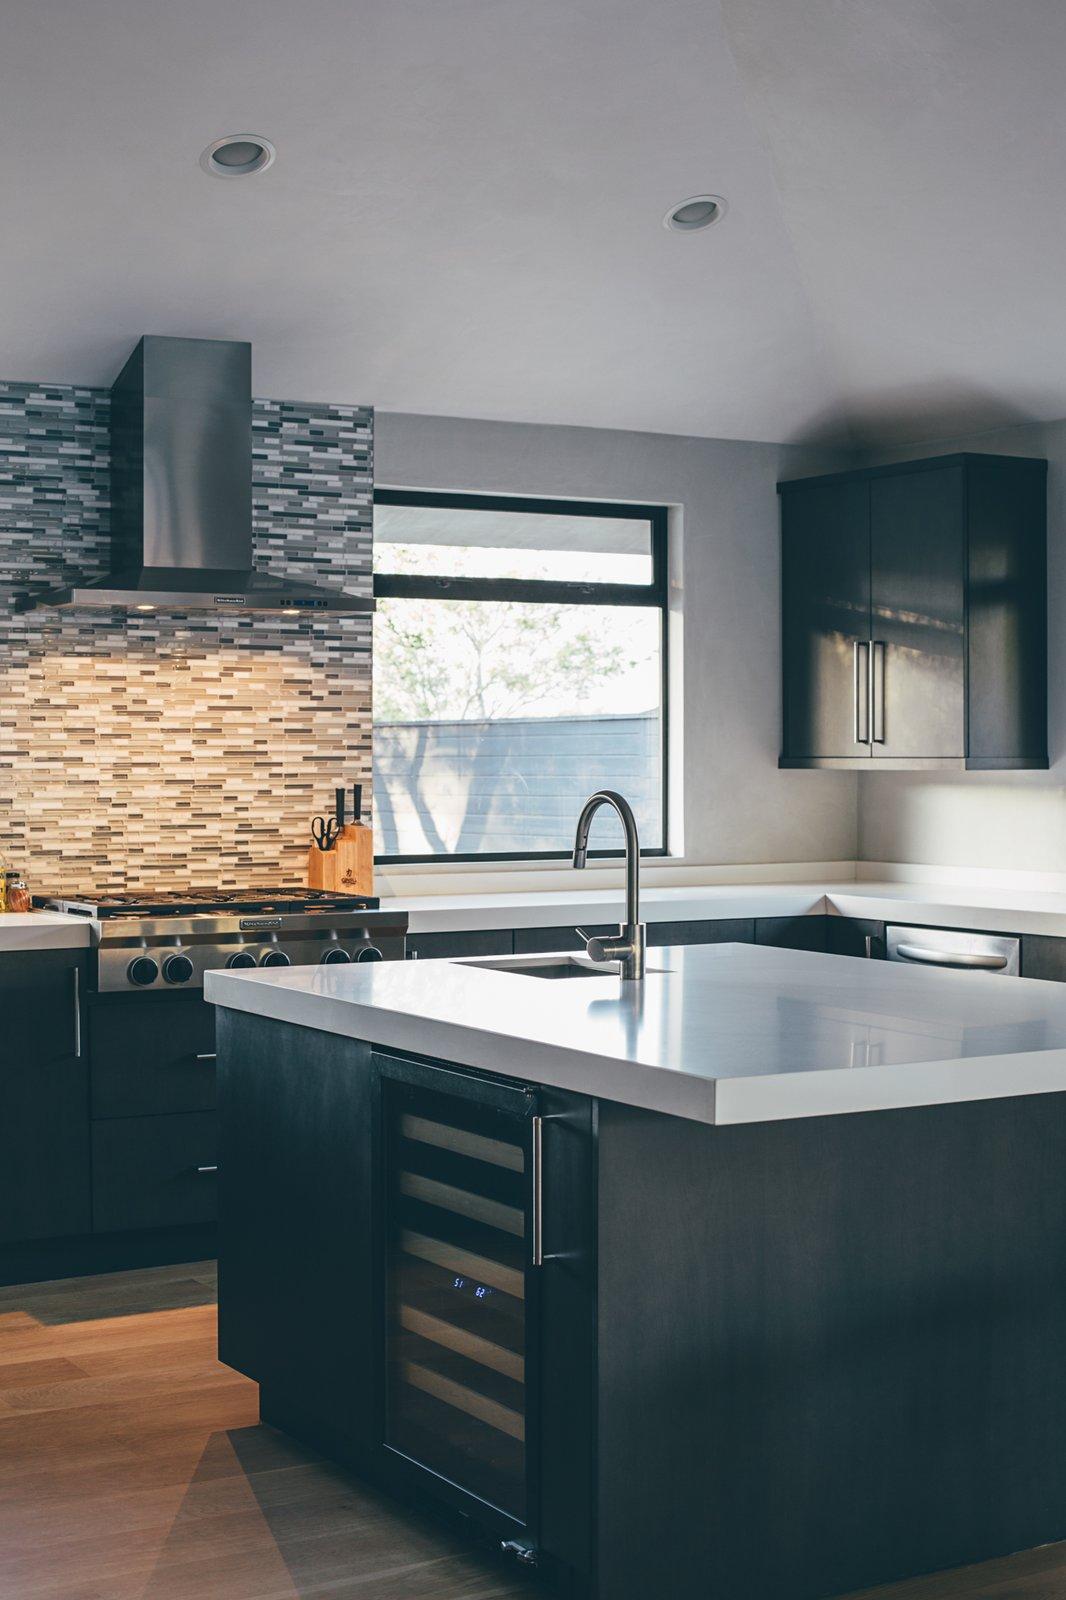 Kitchen, Concrete Counter, Medium Hardwood Floor, Recessed Lighting, Glass Tile Backsplashe, Undermount Sink, and Wine Cooler  Crestline